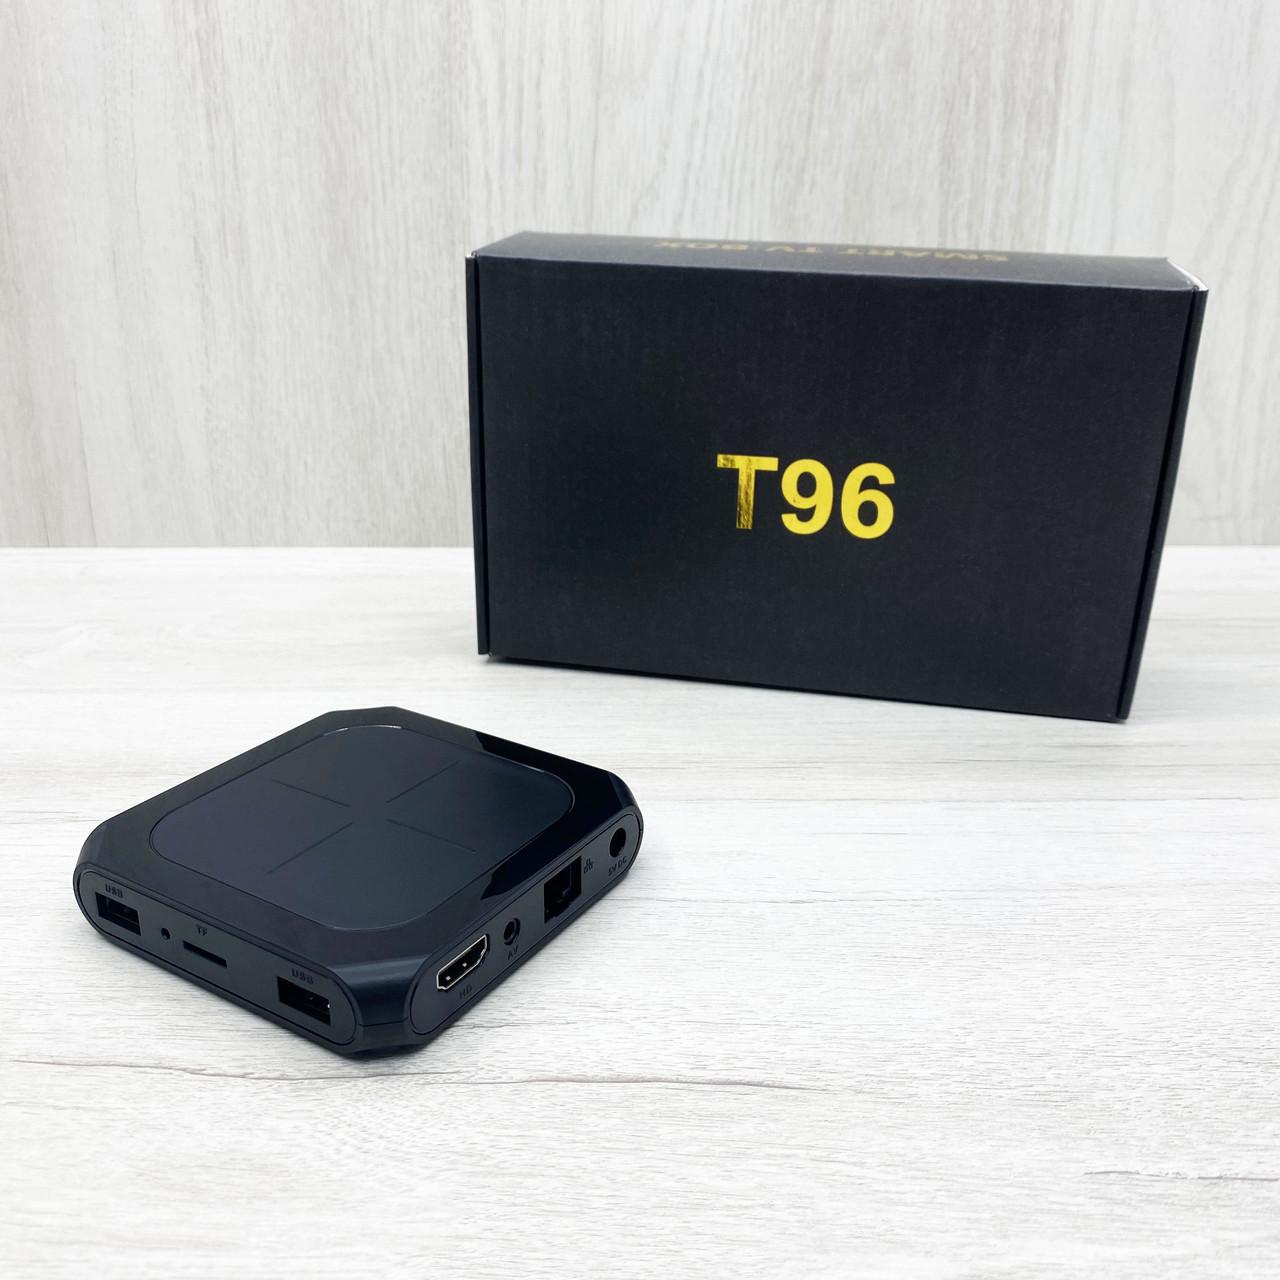 Смарт тв-приставка T96 2/16Gb (чёрная)